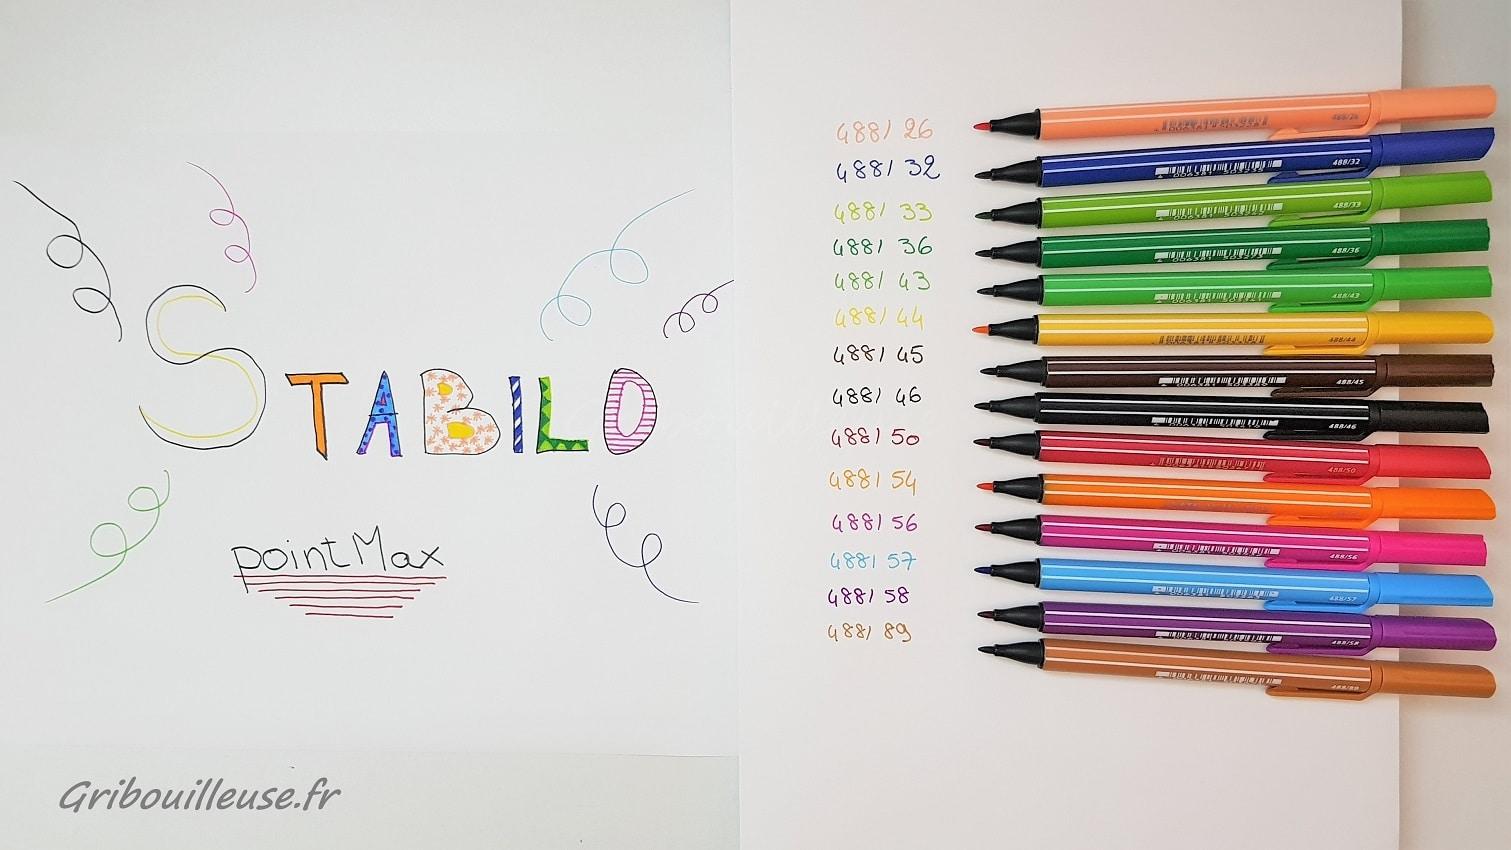 STABILO pointMax